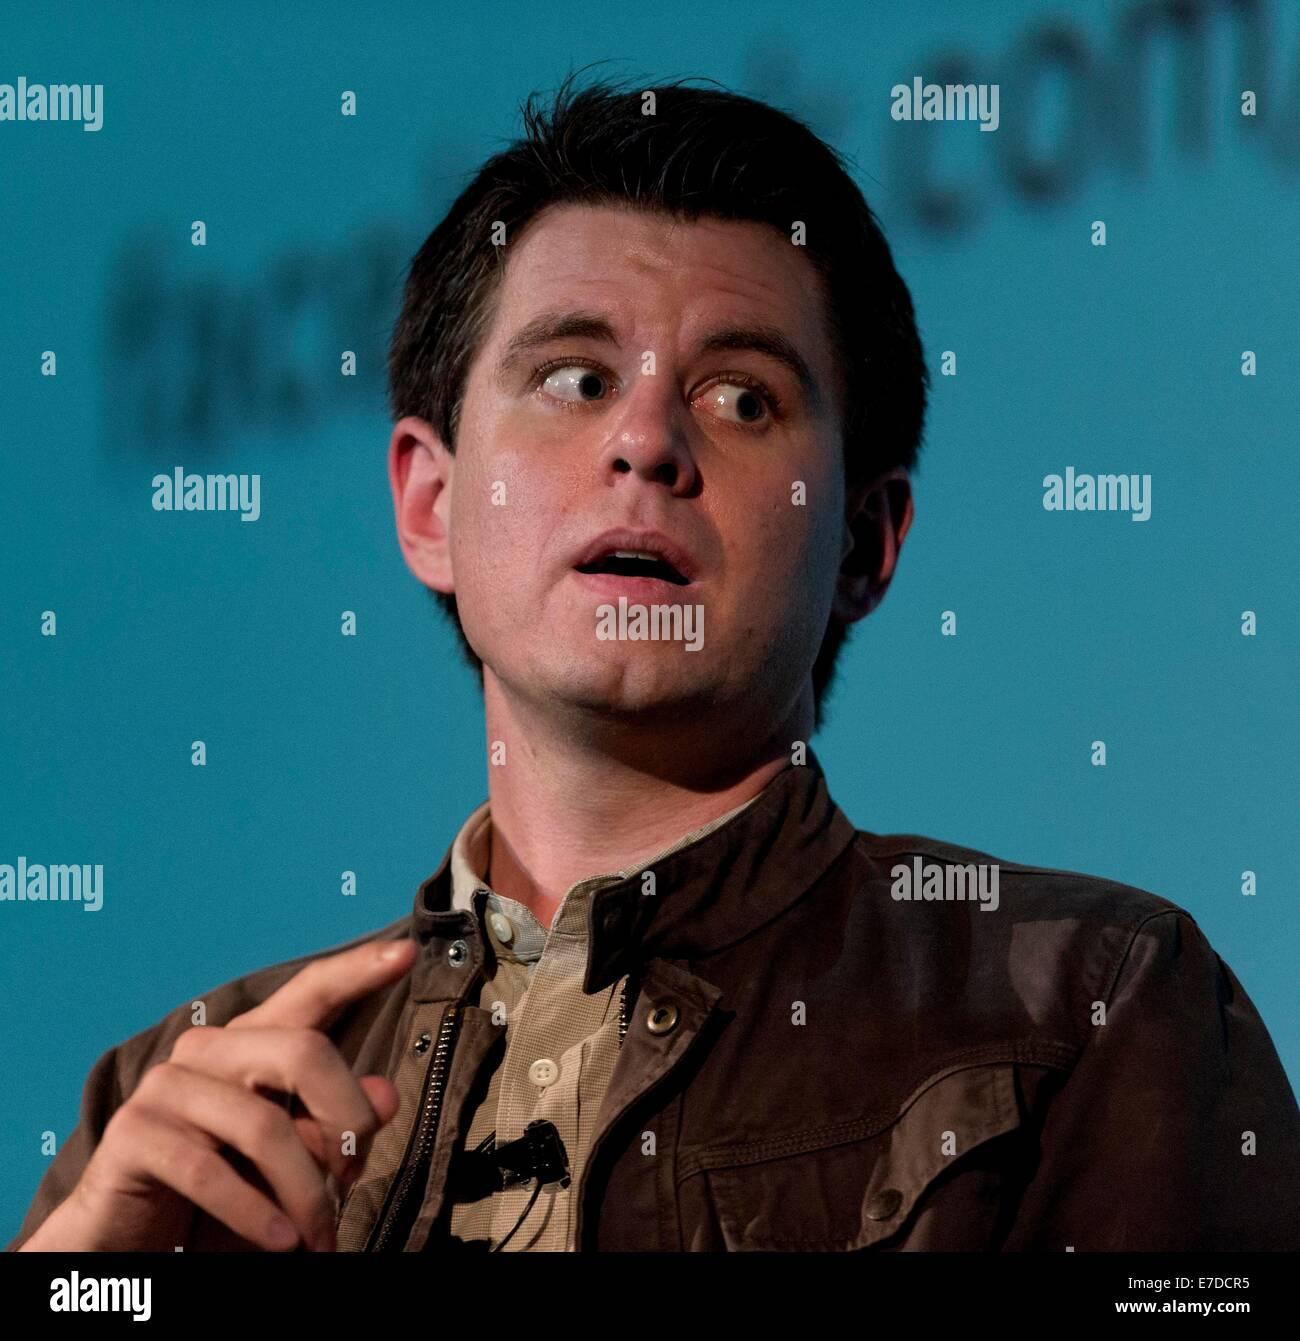 Santa Monica, California, USA. 14 Sep, 2014. RANDALL MUNROE, autor de la web comic xkcd y el New York Times best Foto de stock